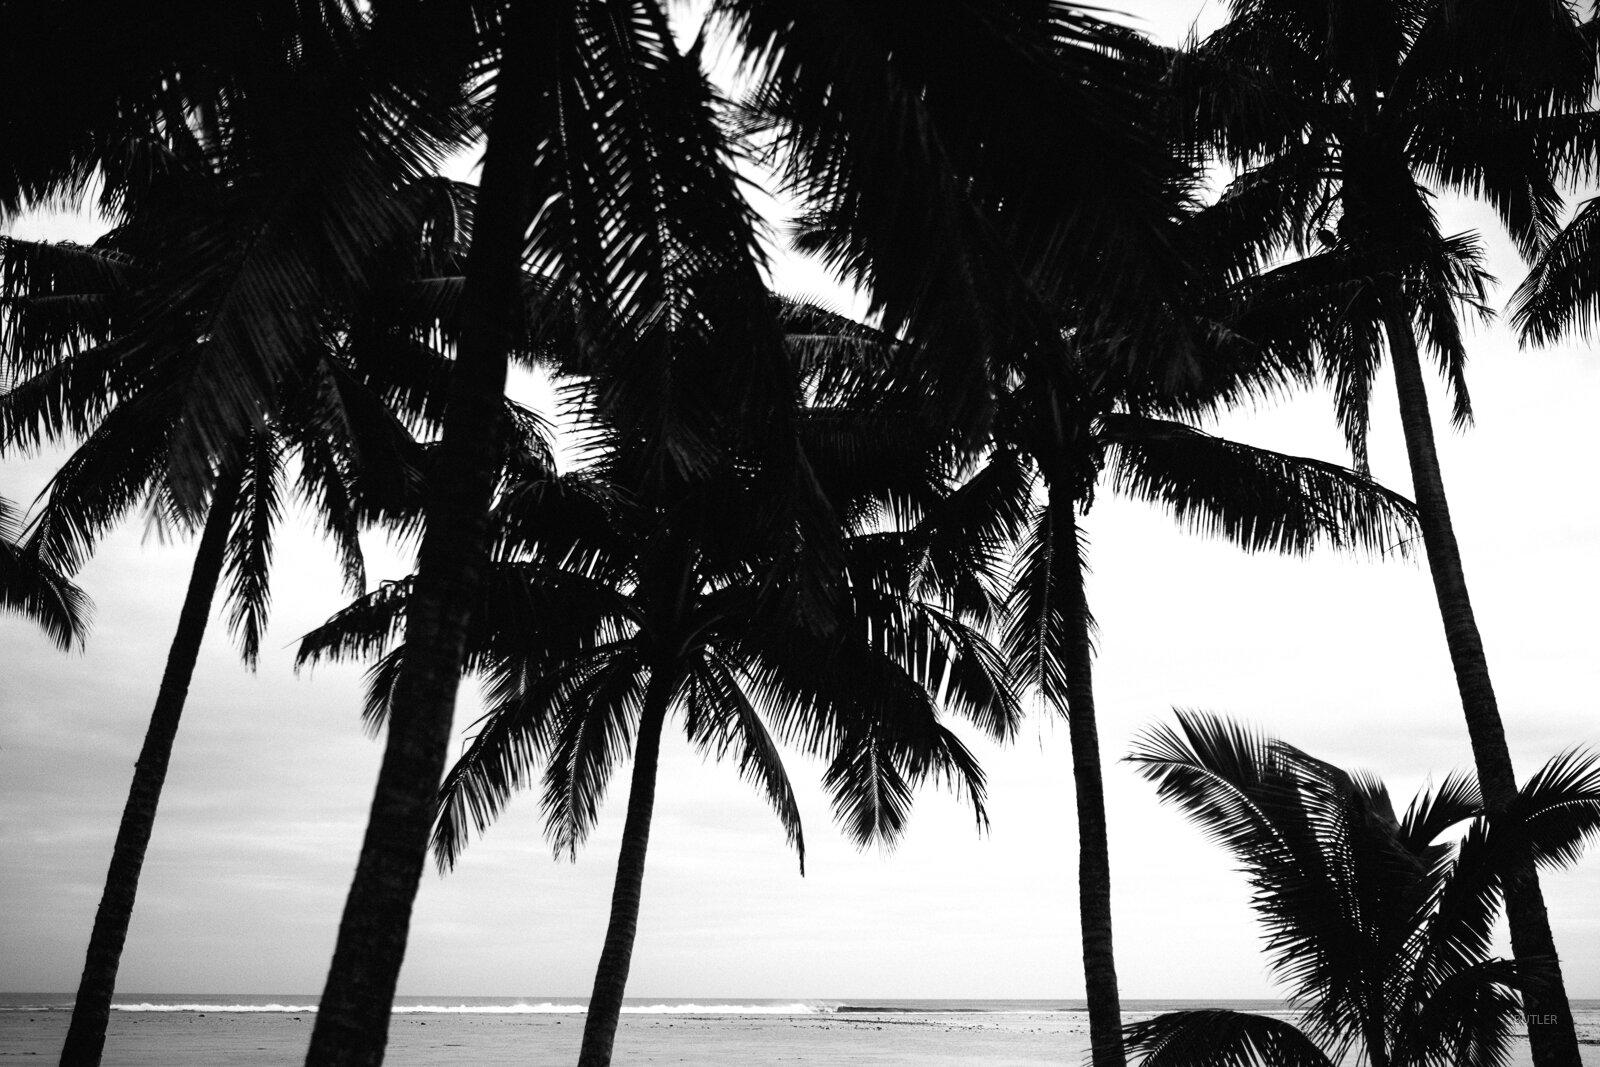 toby-butler-photo-devon-cornwall-lifestyle-photogrpher-photography-travel-culture-commercial-editorial-advertising-marketing-photo-surfer-girl-swimwear-sports-wear-clothing-england-united-kingdom-europe40.jpg